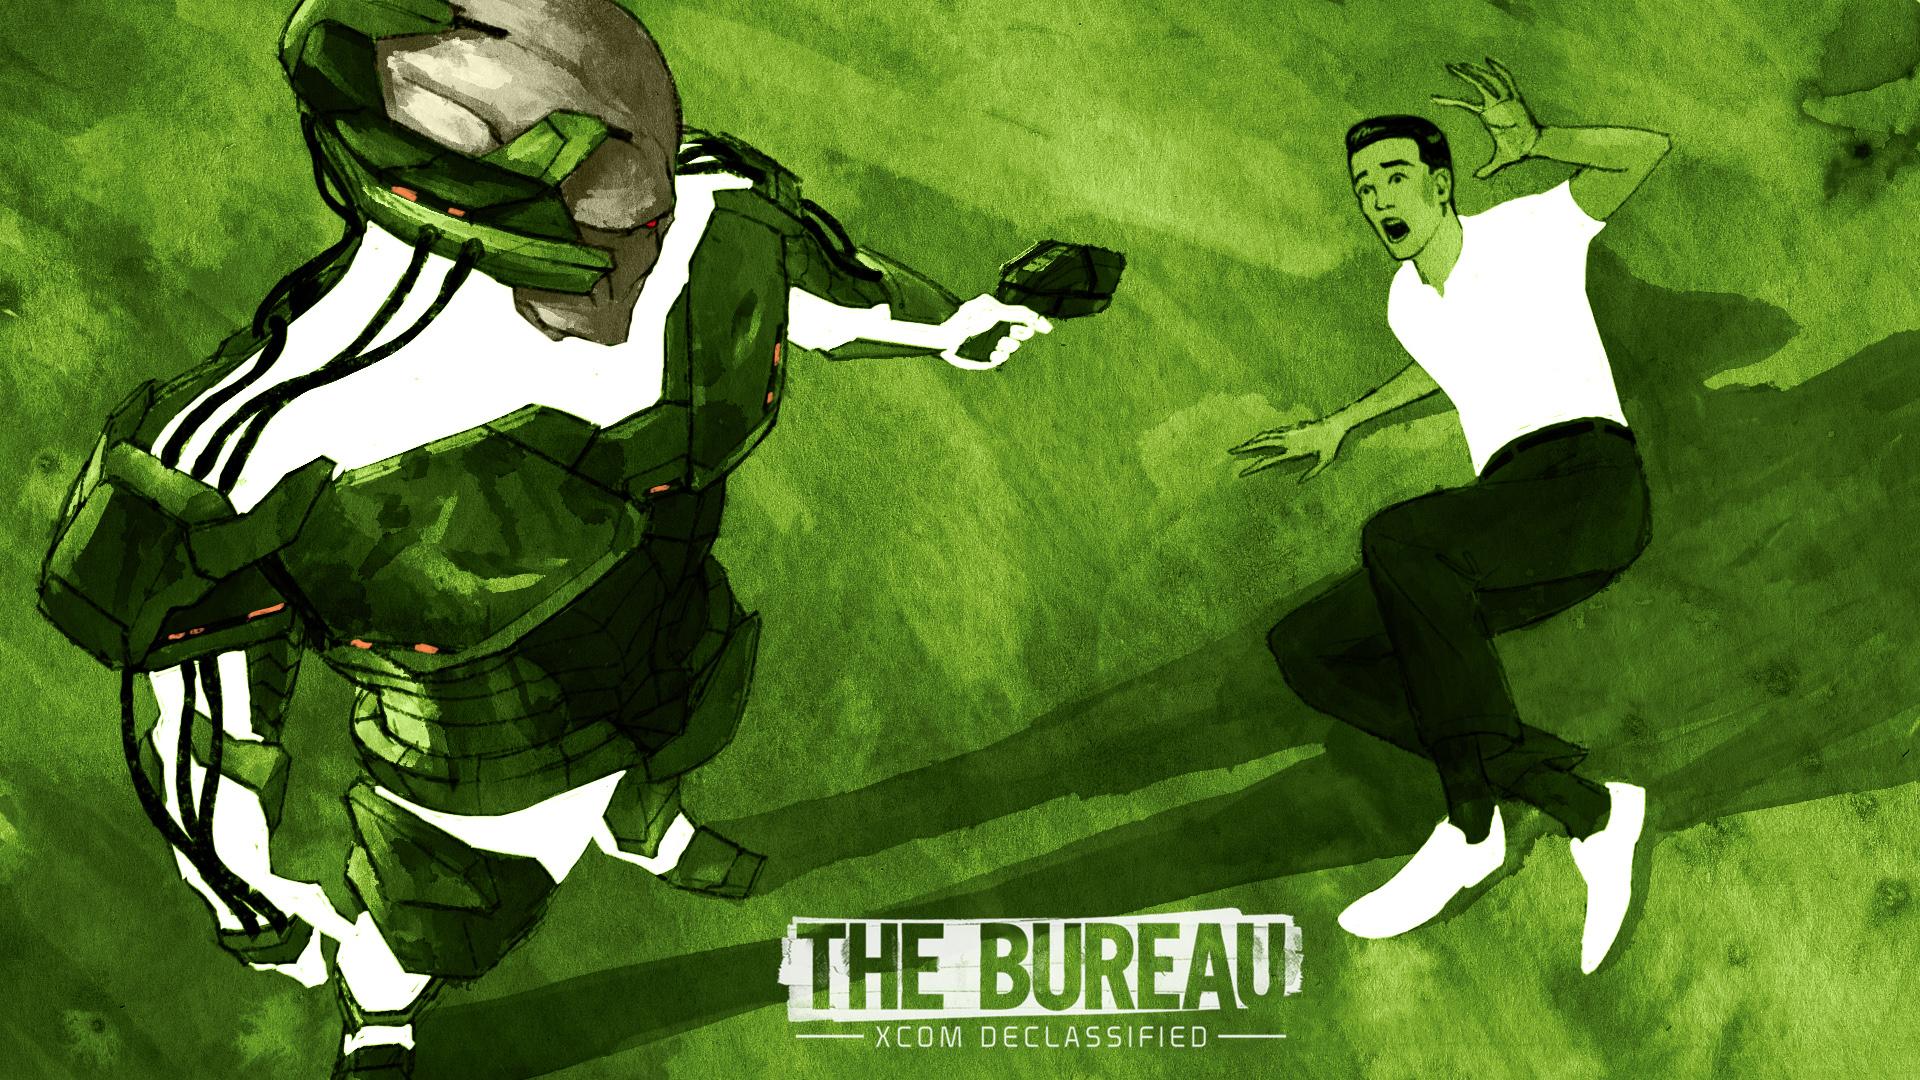 Image The Bureau XCOM Declassified Artwork 5jpg Steam Trading